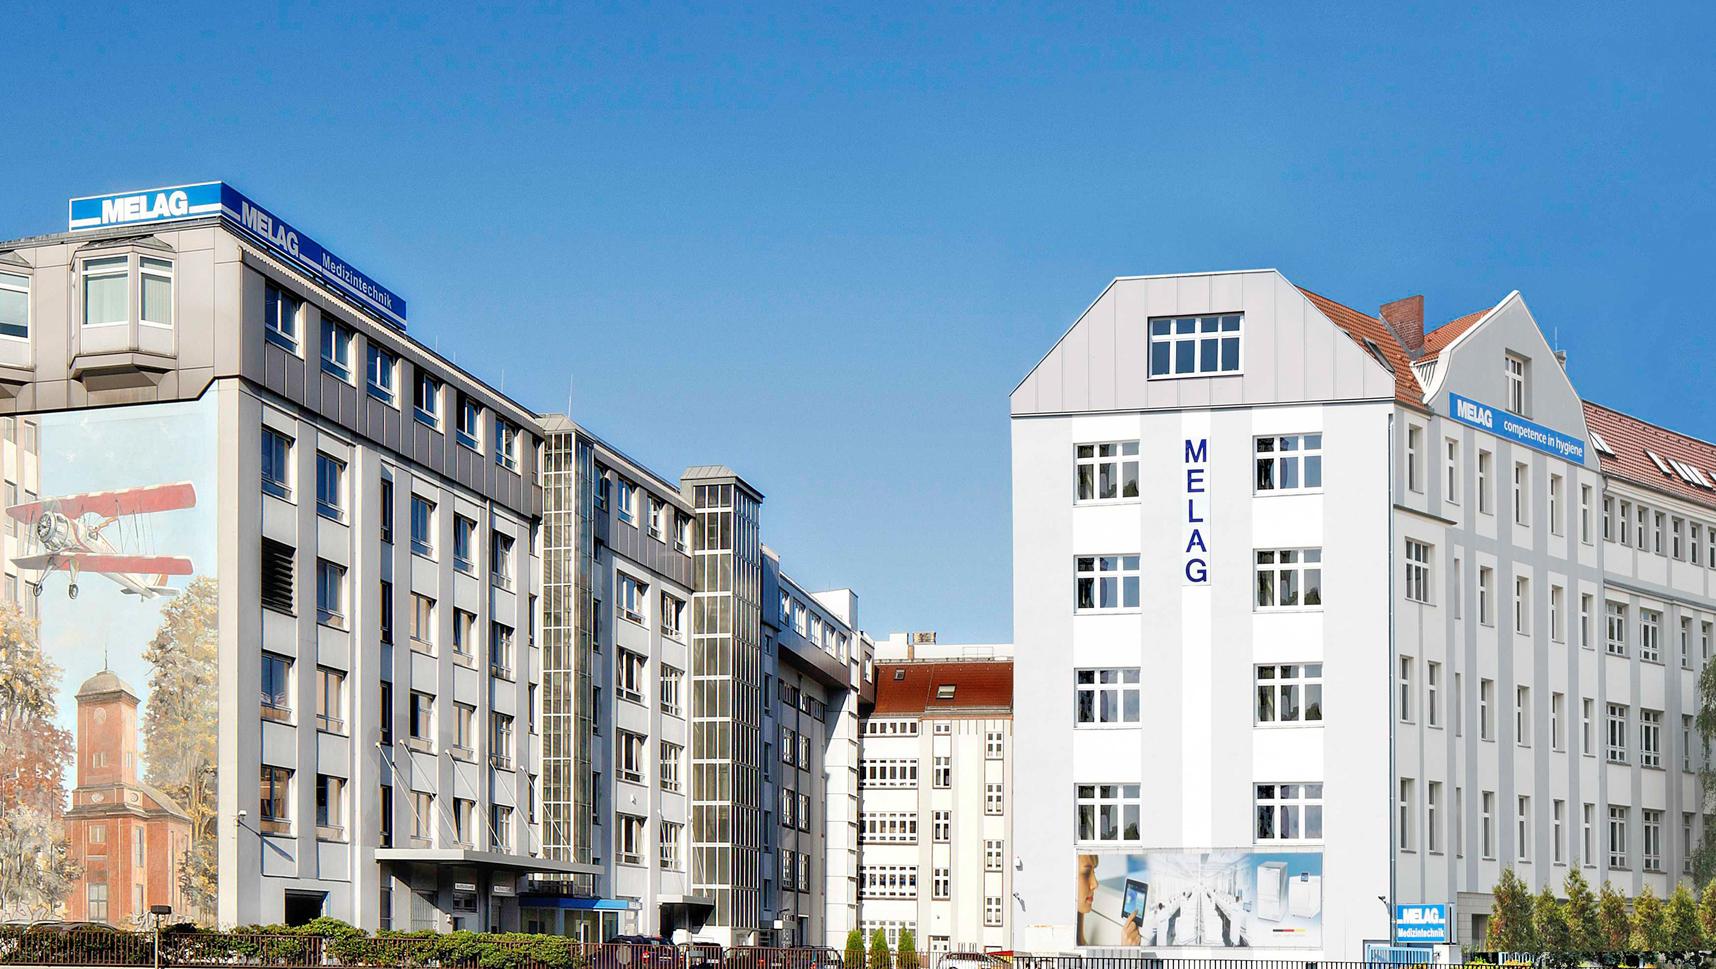 MELAG Firmenkomplex in Berlin